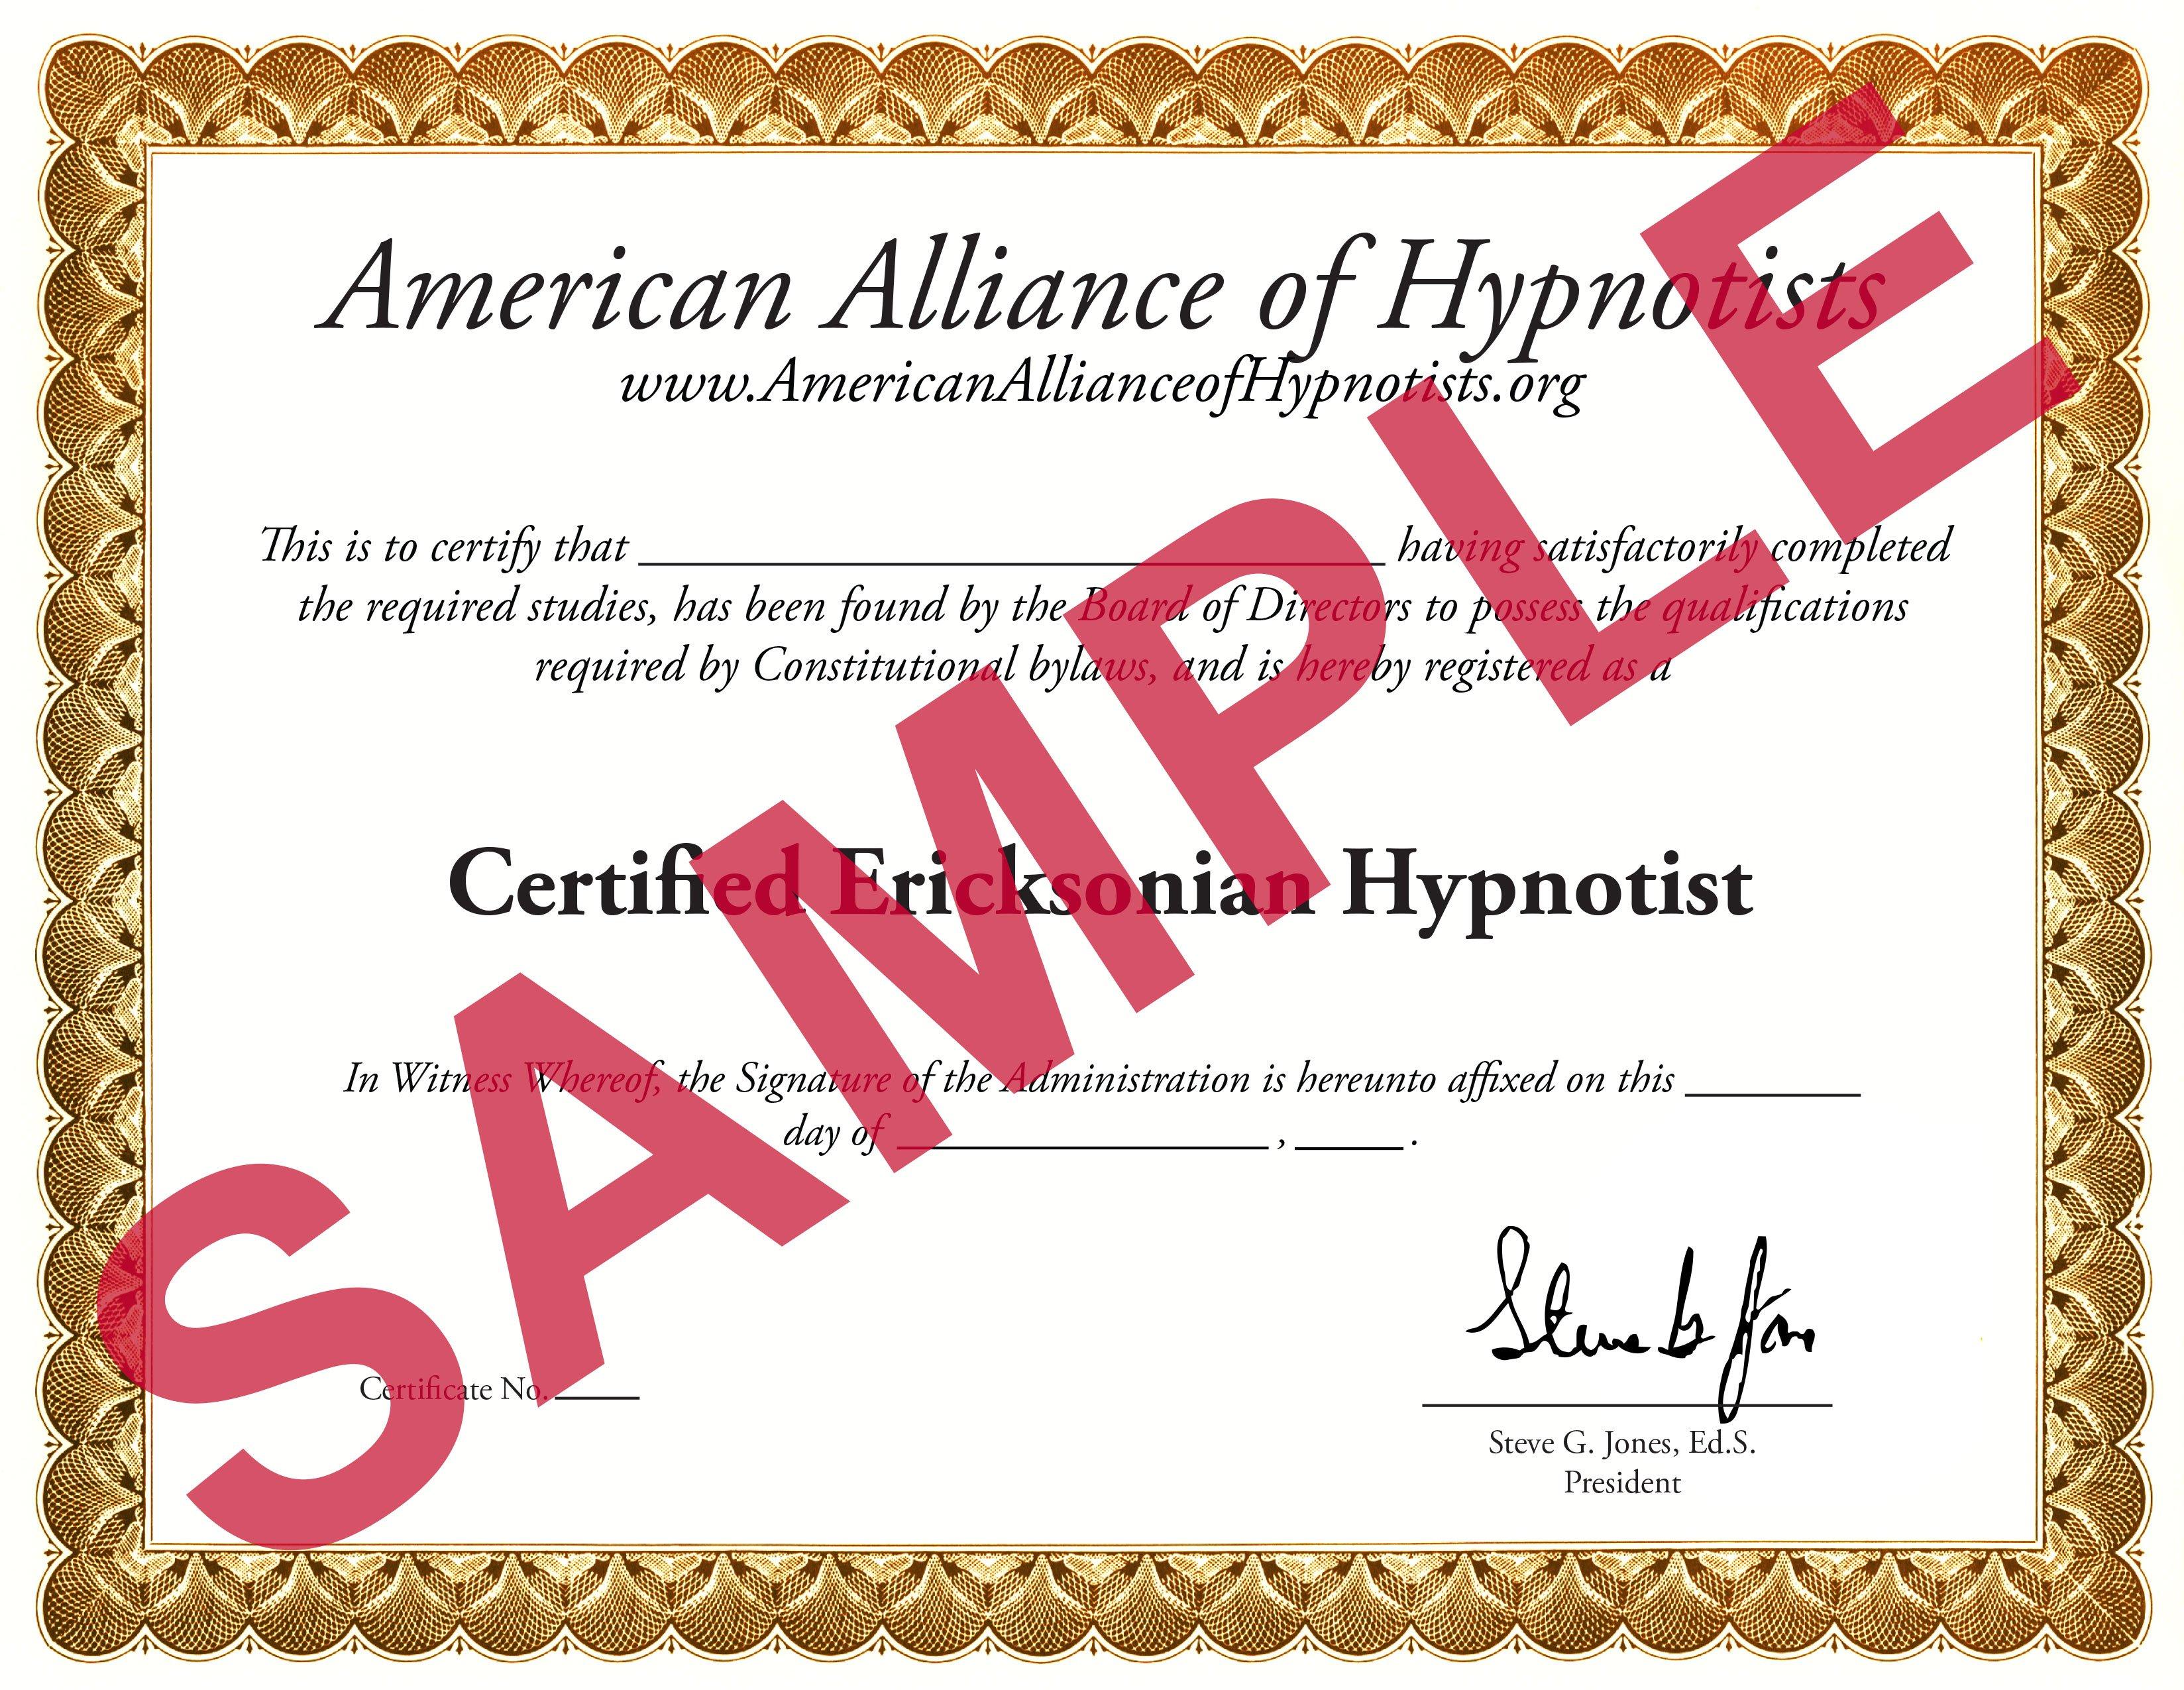 Ericksonian Hypnosis Certification Course